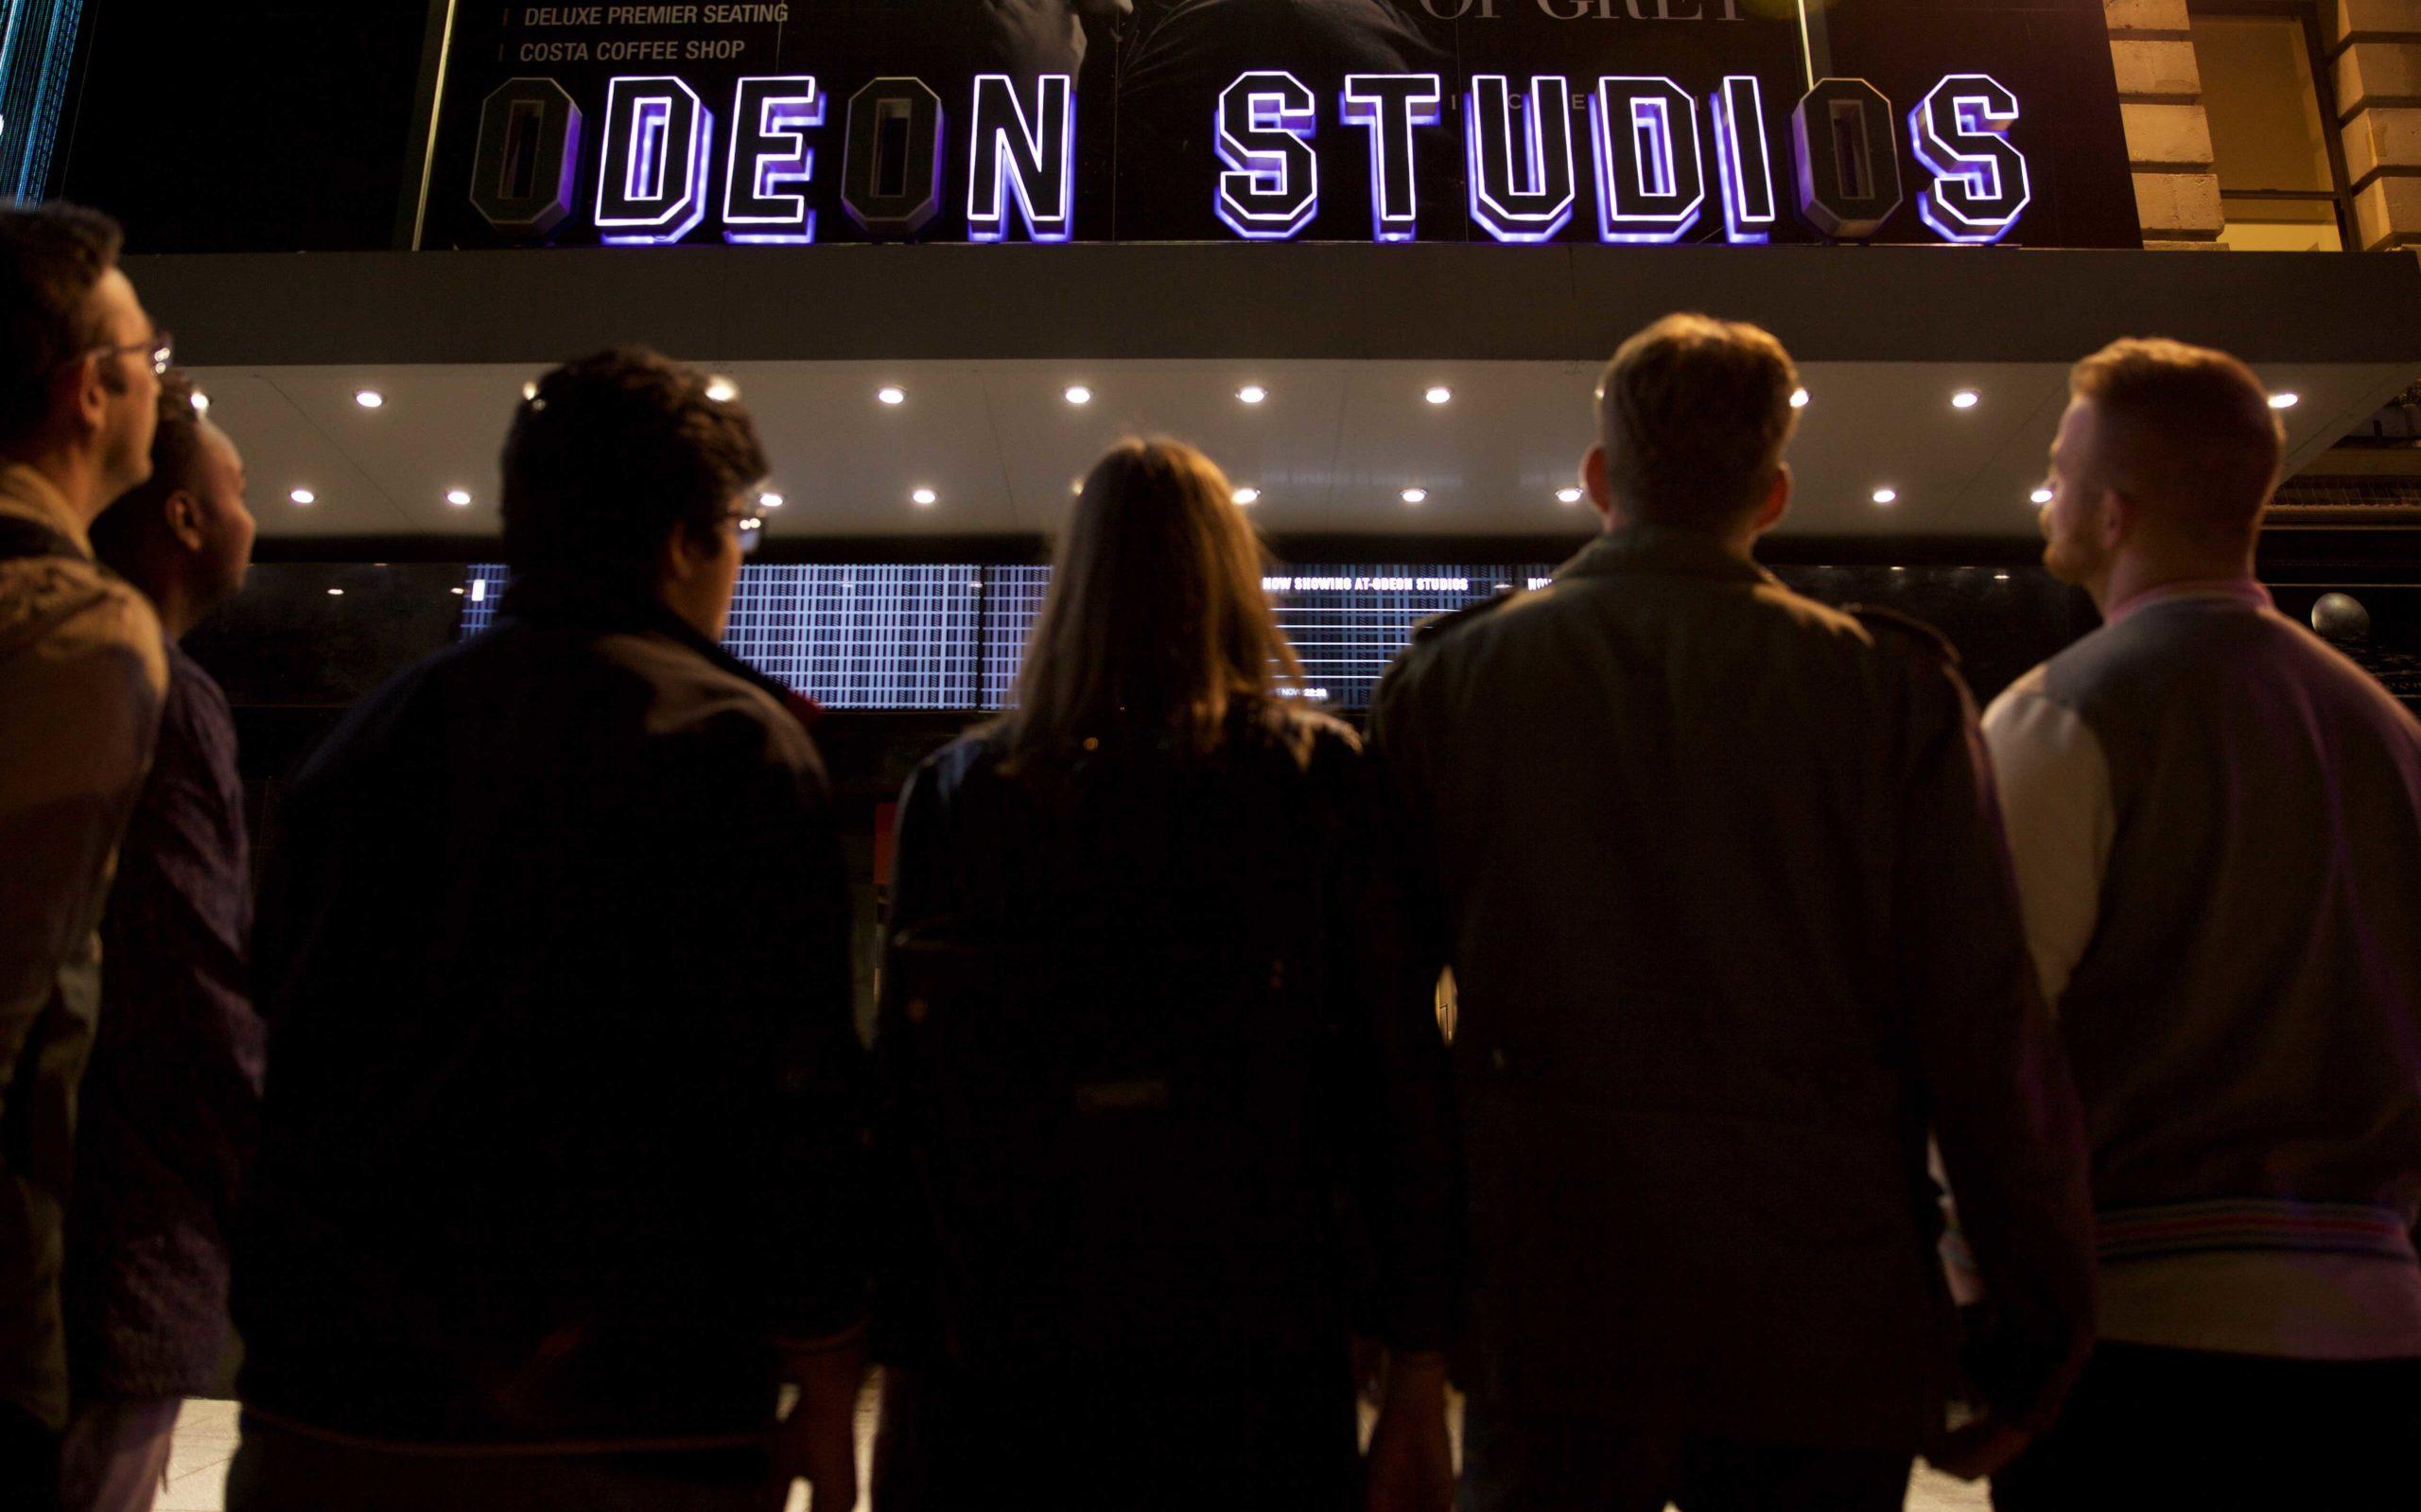 Odeon-studios-image